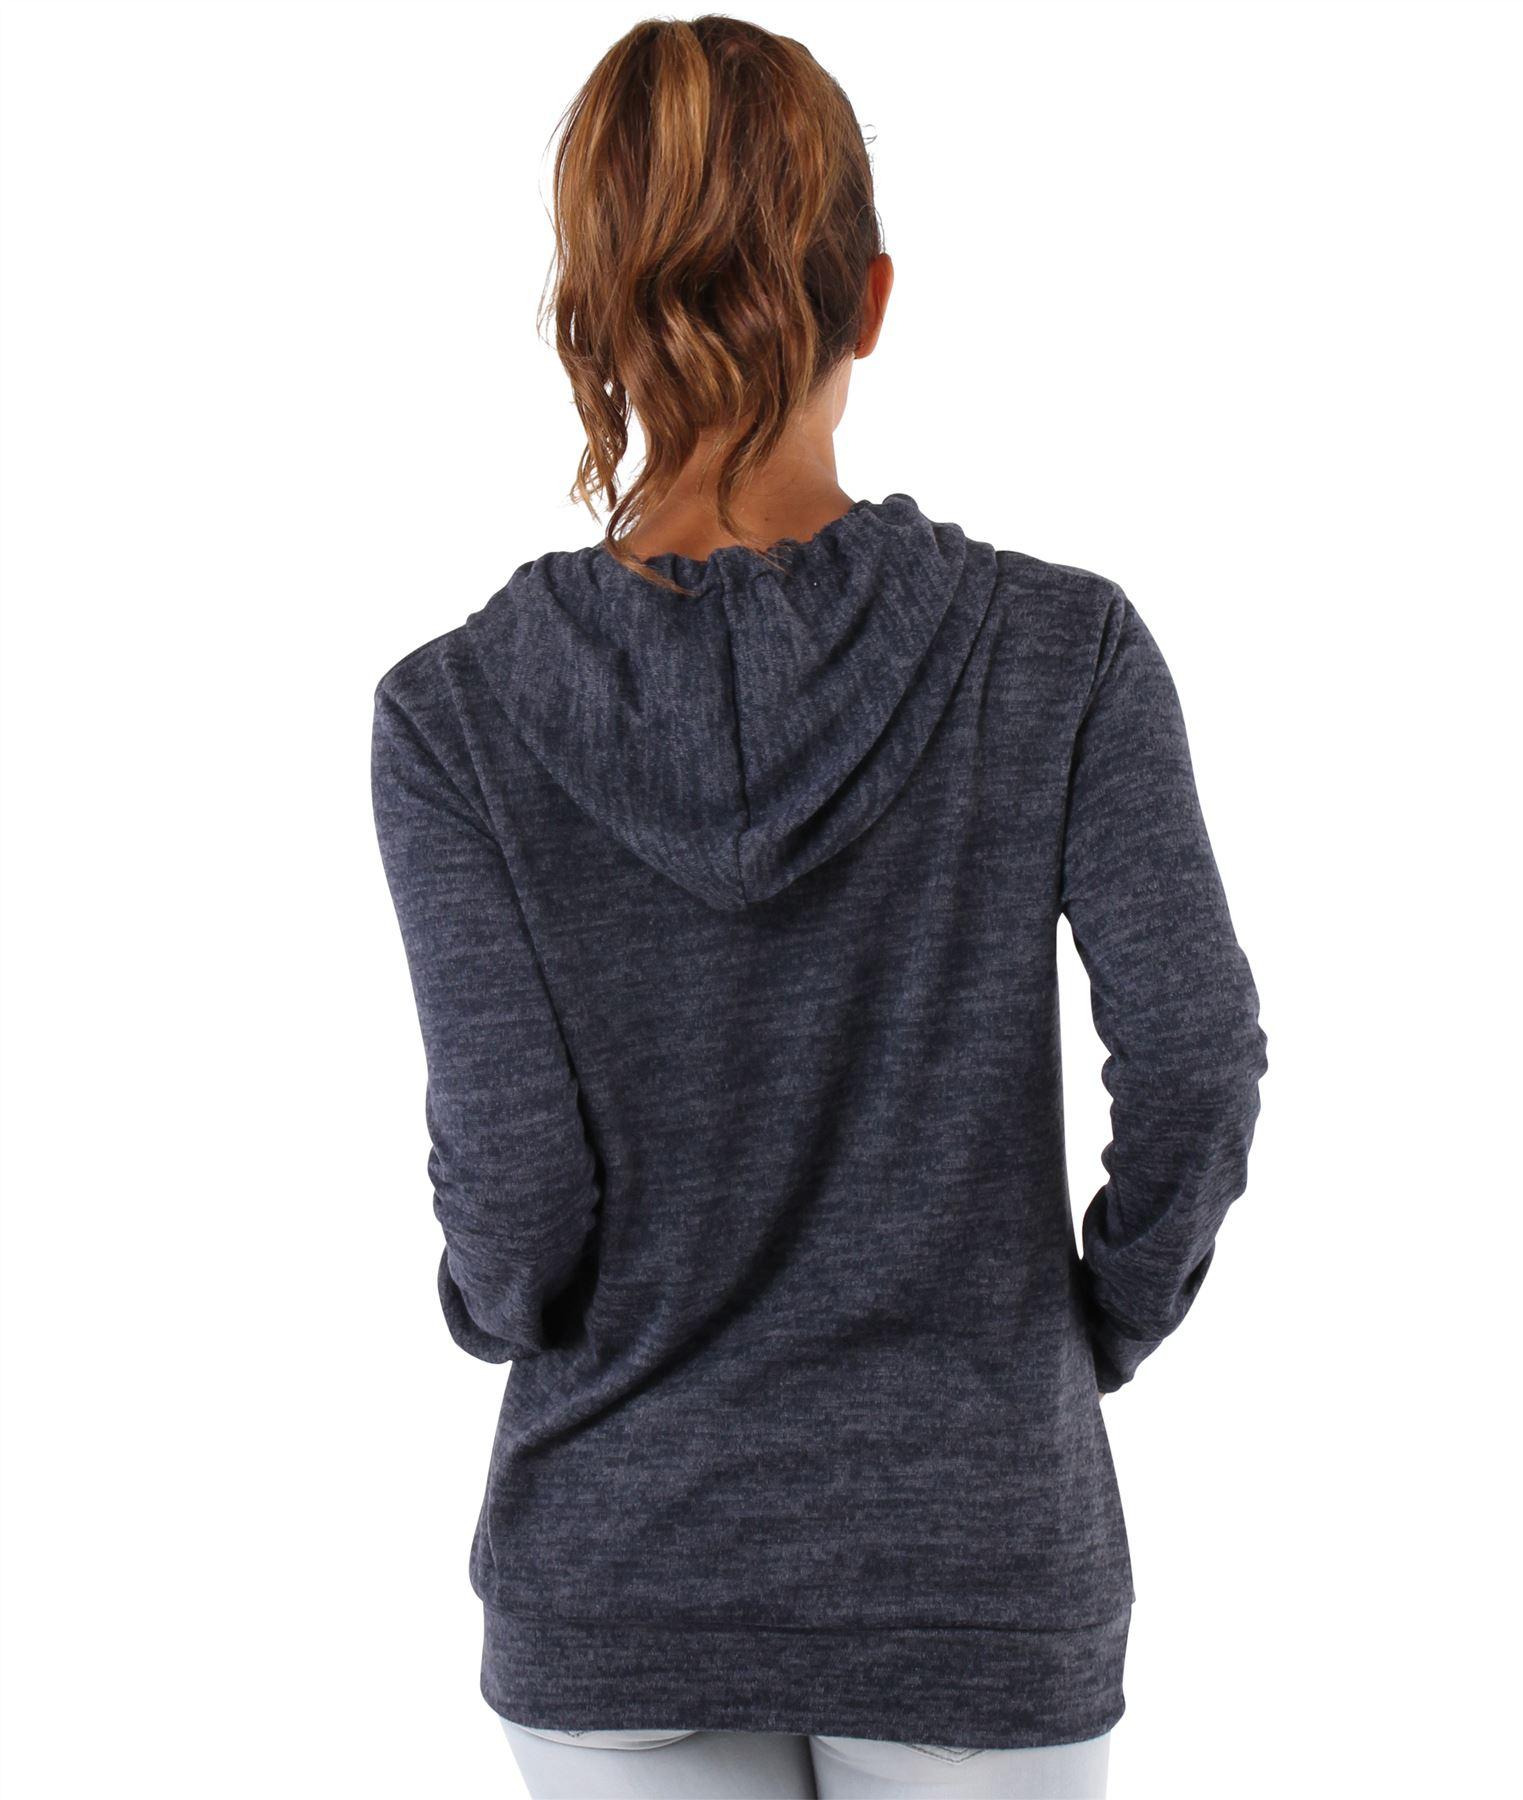 Womens-Soft-Marl-Knit-Hoodie-Hooded-Loose-Baggy-Jumper-Sweater-Top-Sweatshirt thumbnail 7